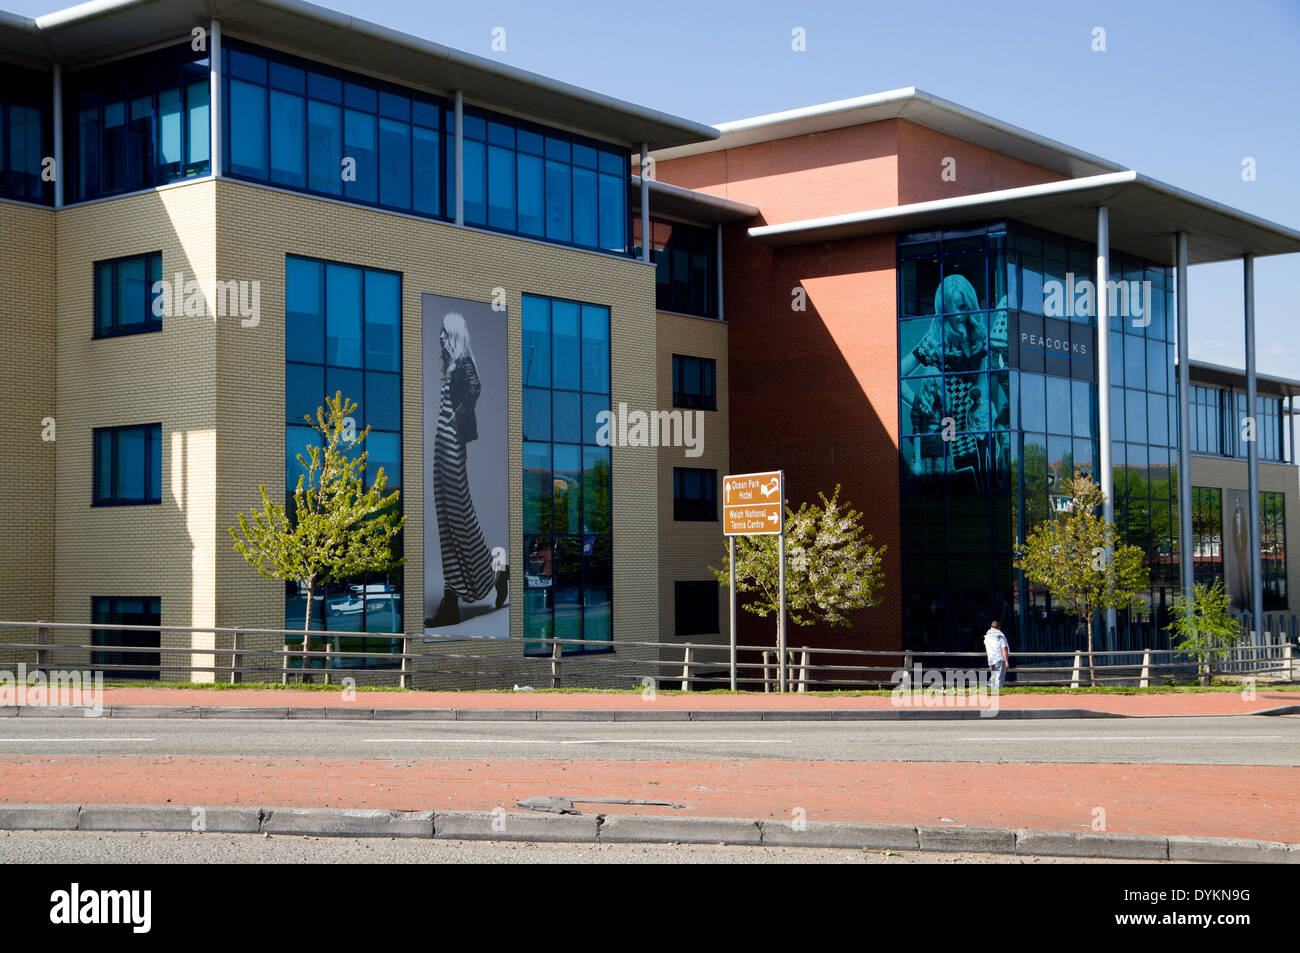 Peacocks retail corporate headquarters, Cardiff, Wales. - Stock Image